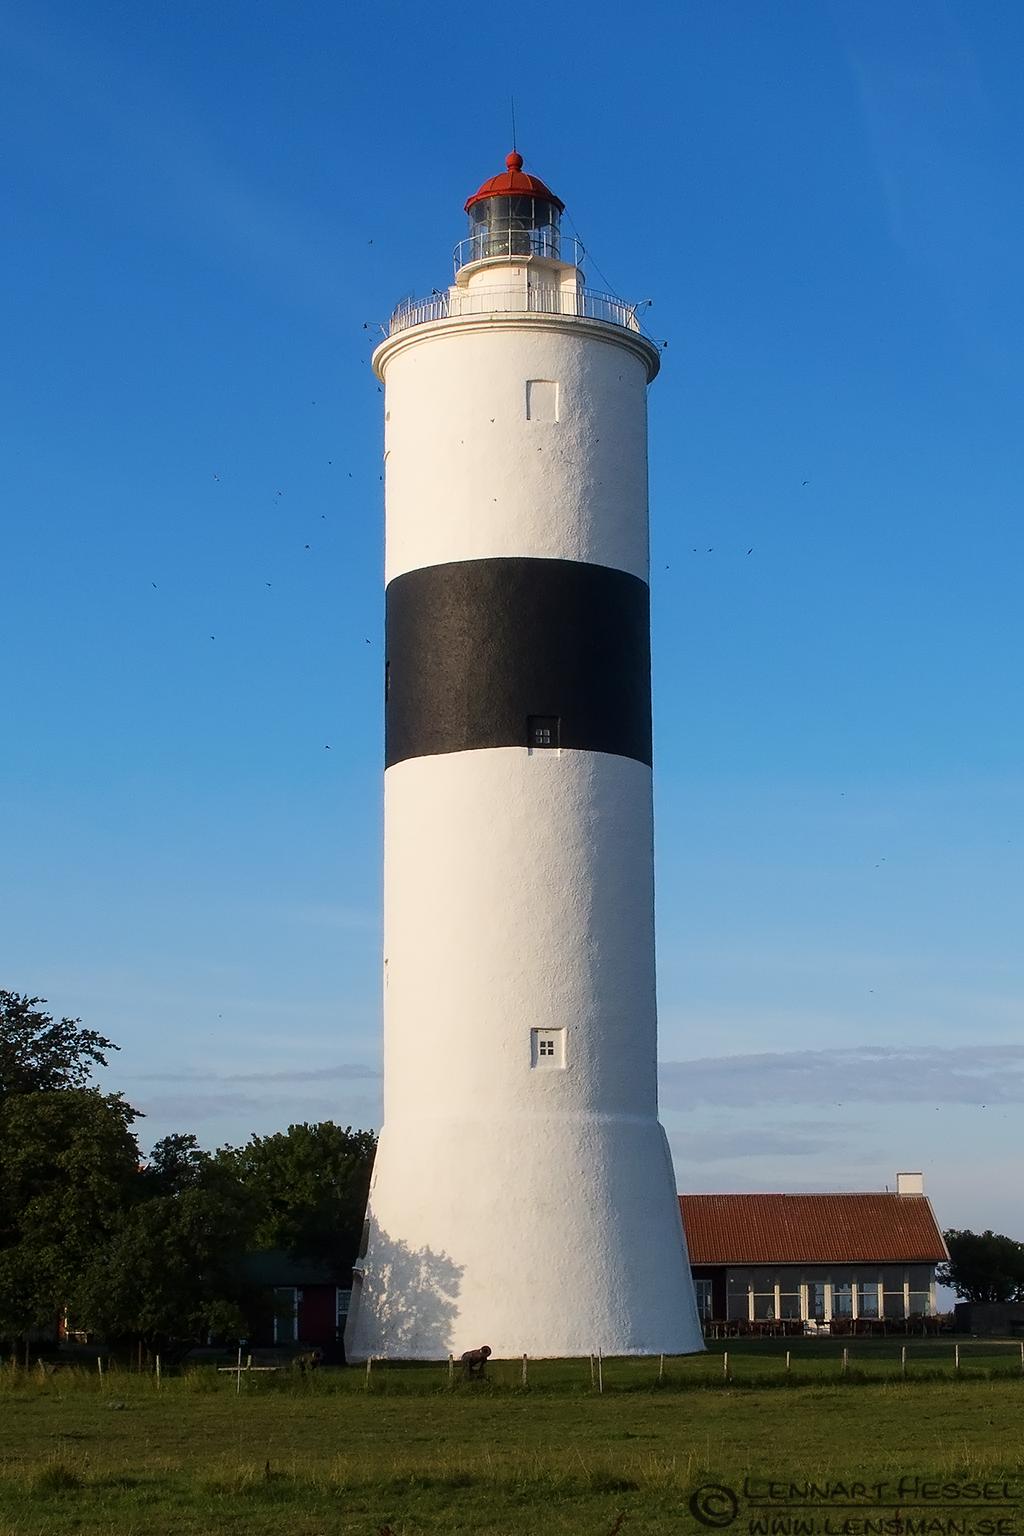 Lighthouse Långe Jan Öland 2012